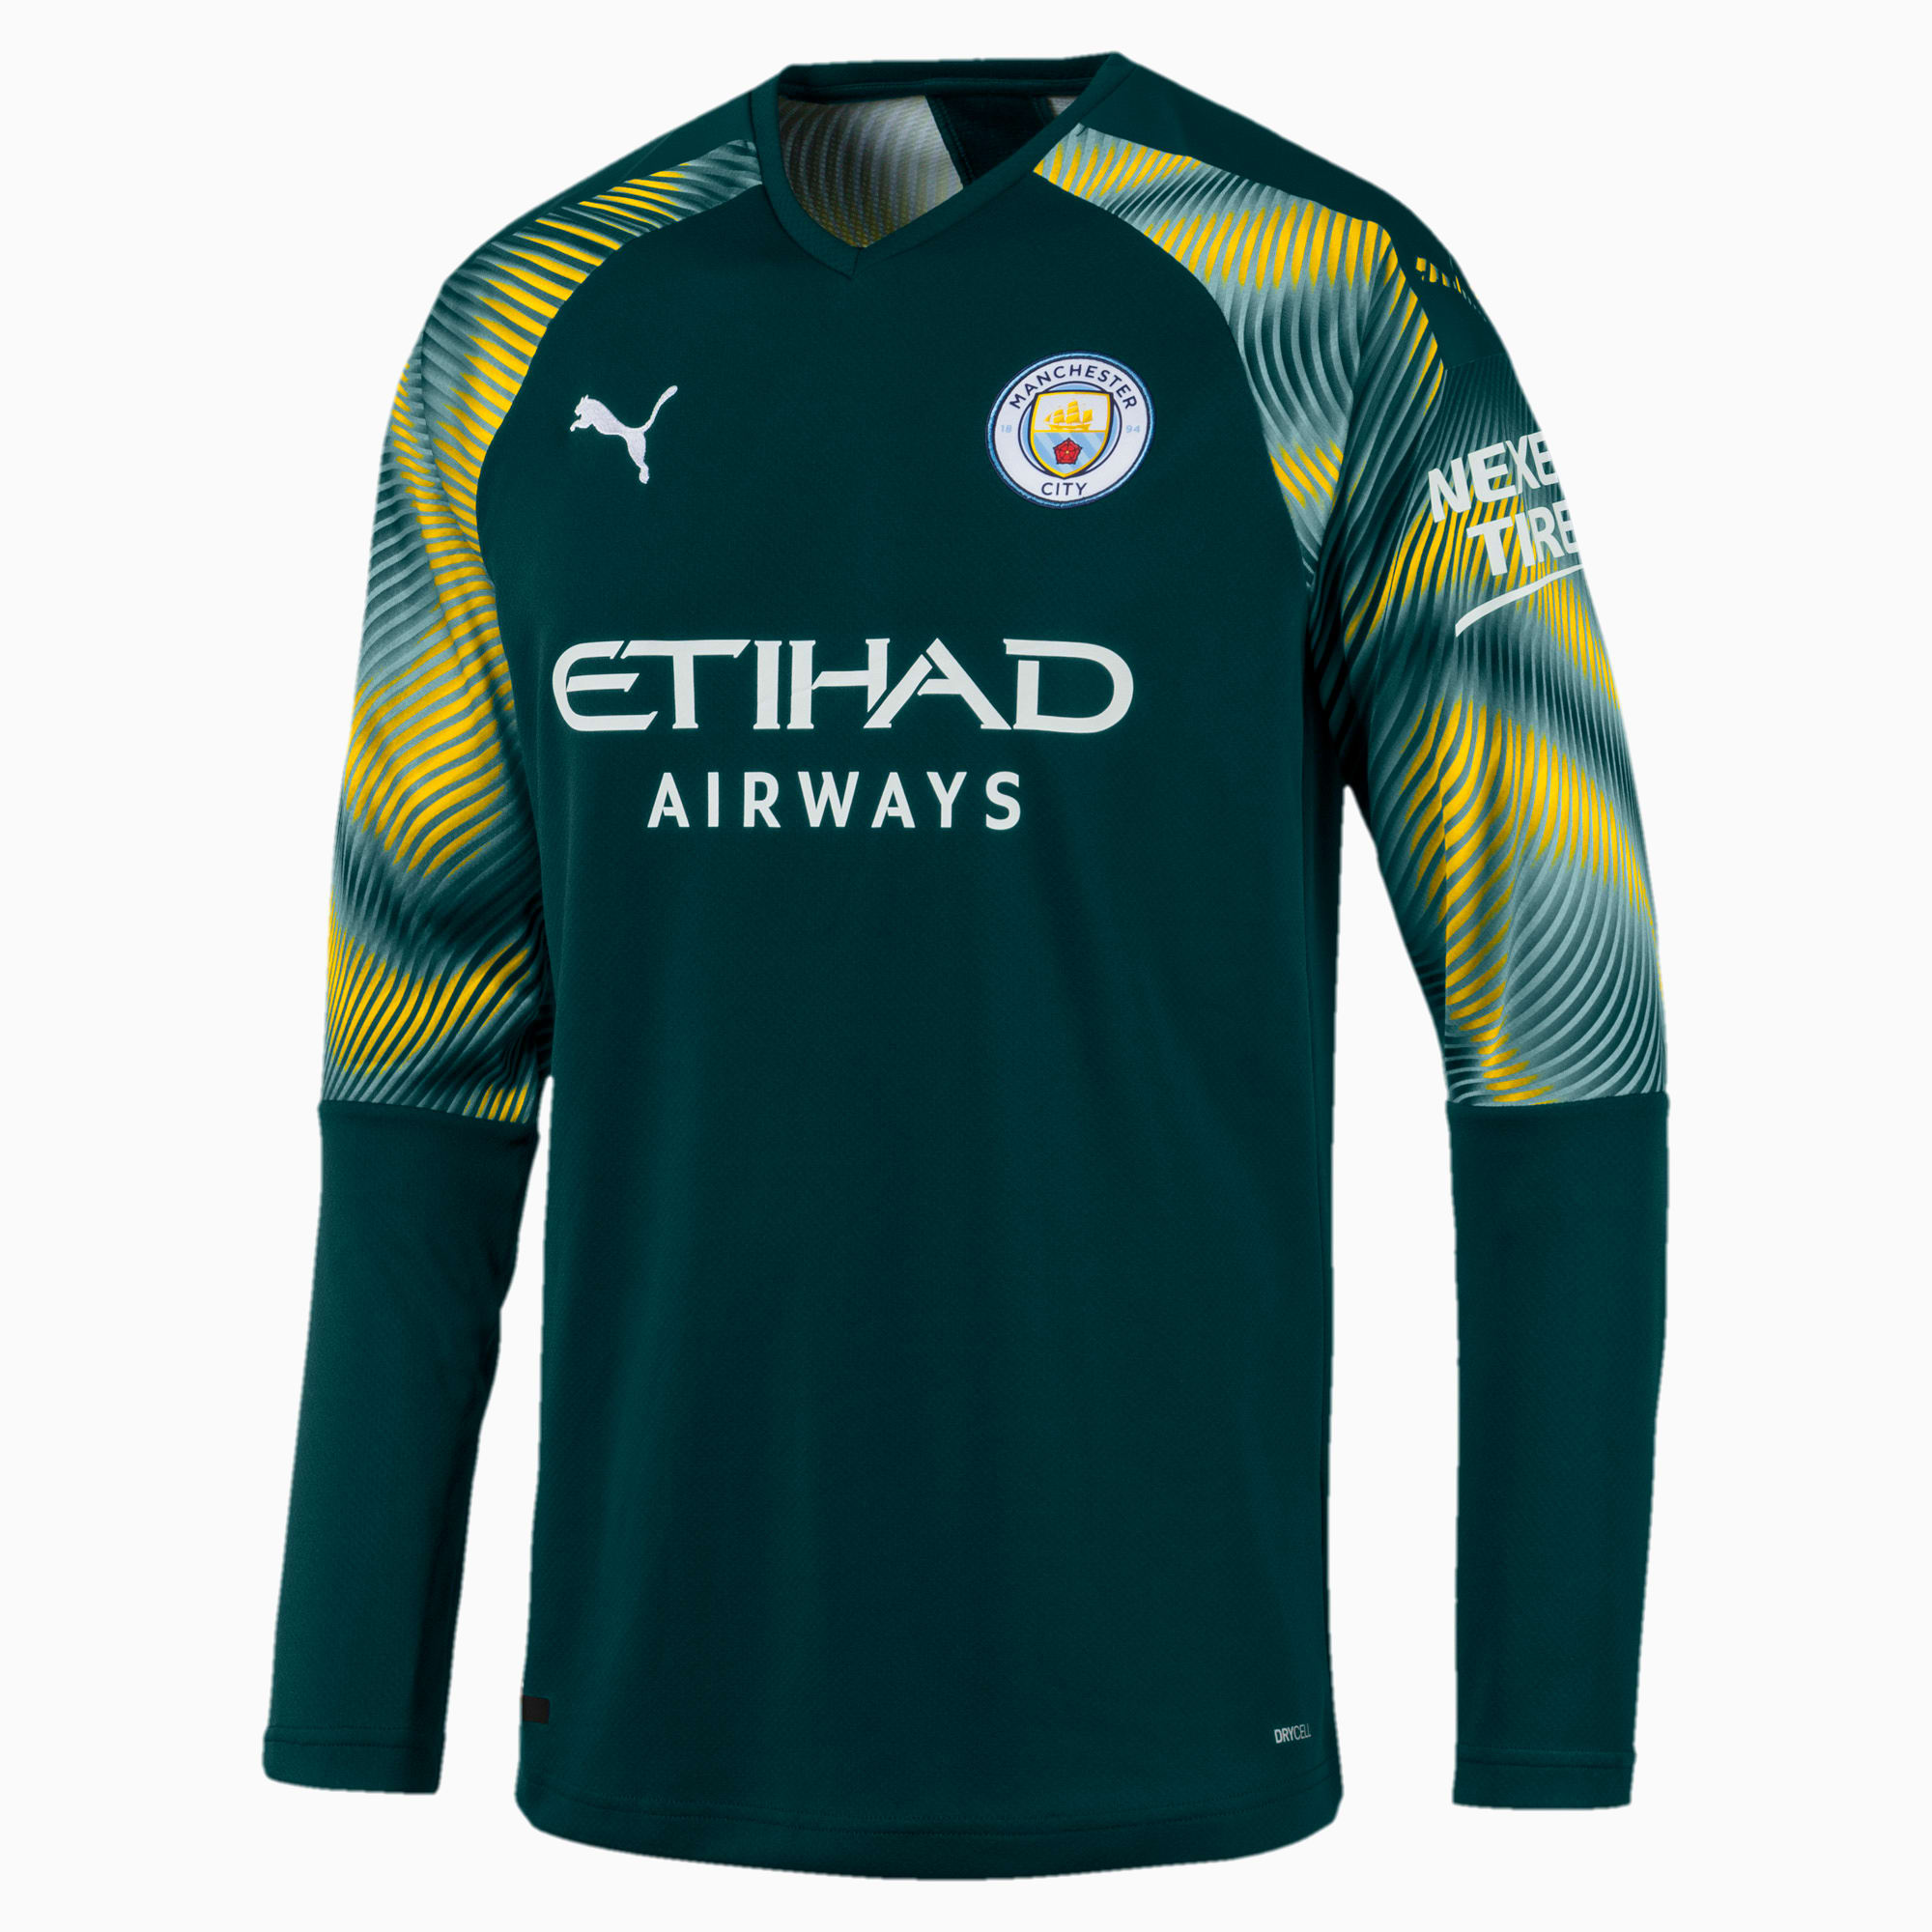 Camisa Manchester City 2019 20 (Away Uniforme 2)